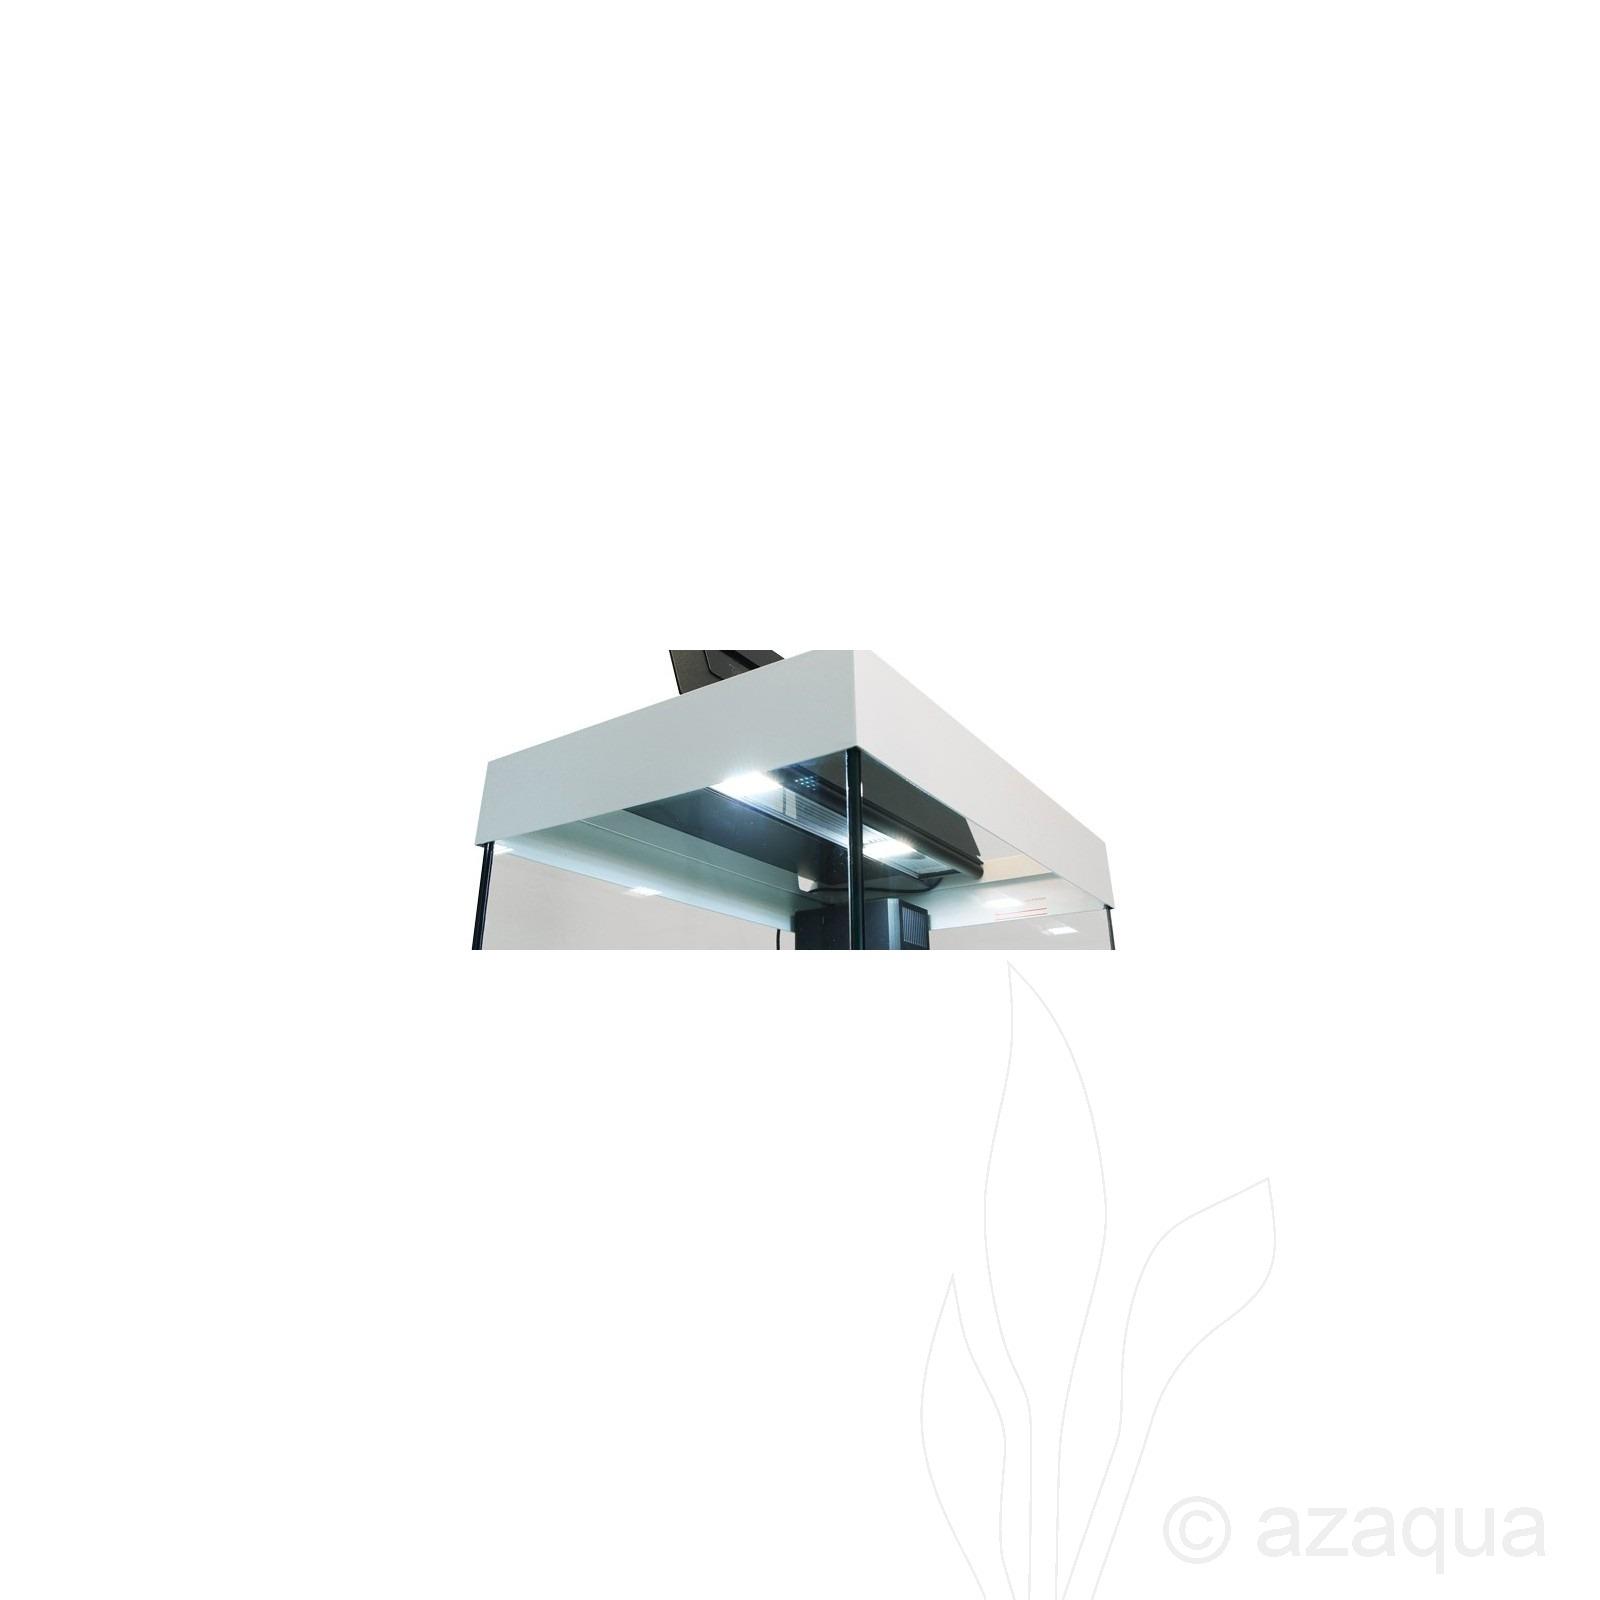 https://www.azaqua.nl/2281-thickbox_default/daytime-adapter-profile-juwel.jpg